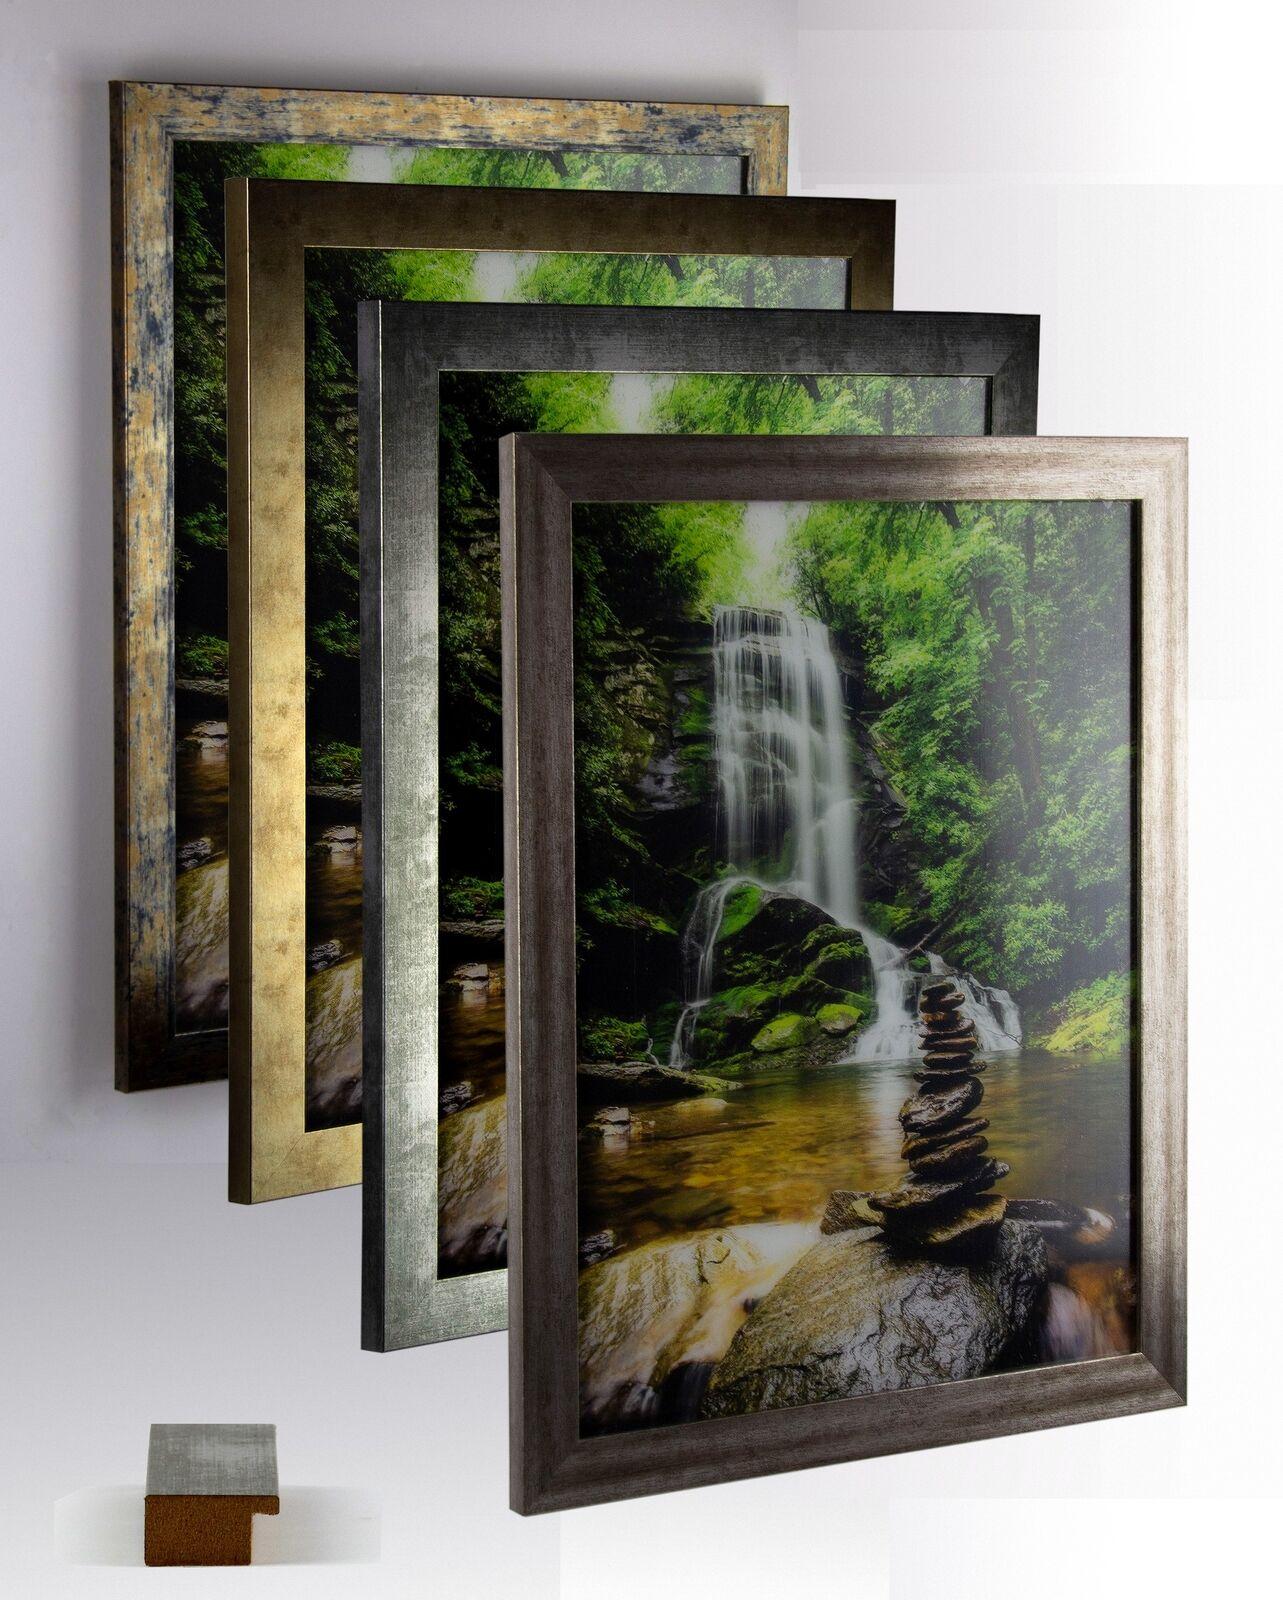 Bilderrahmen MDF Holz Juno Größenwahl DIN A Panorama USA Quadrat Puzzle Vintage